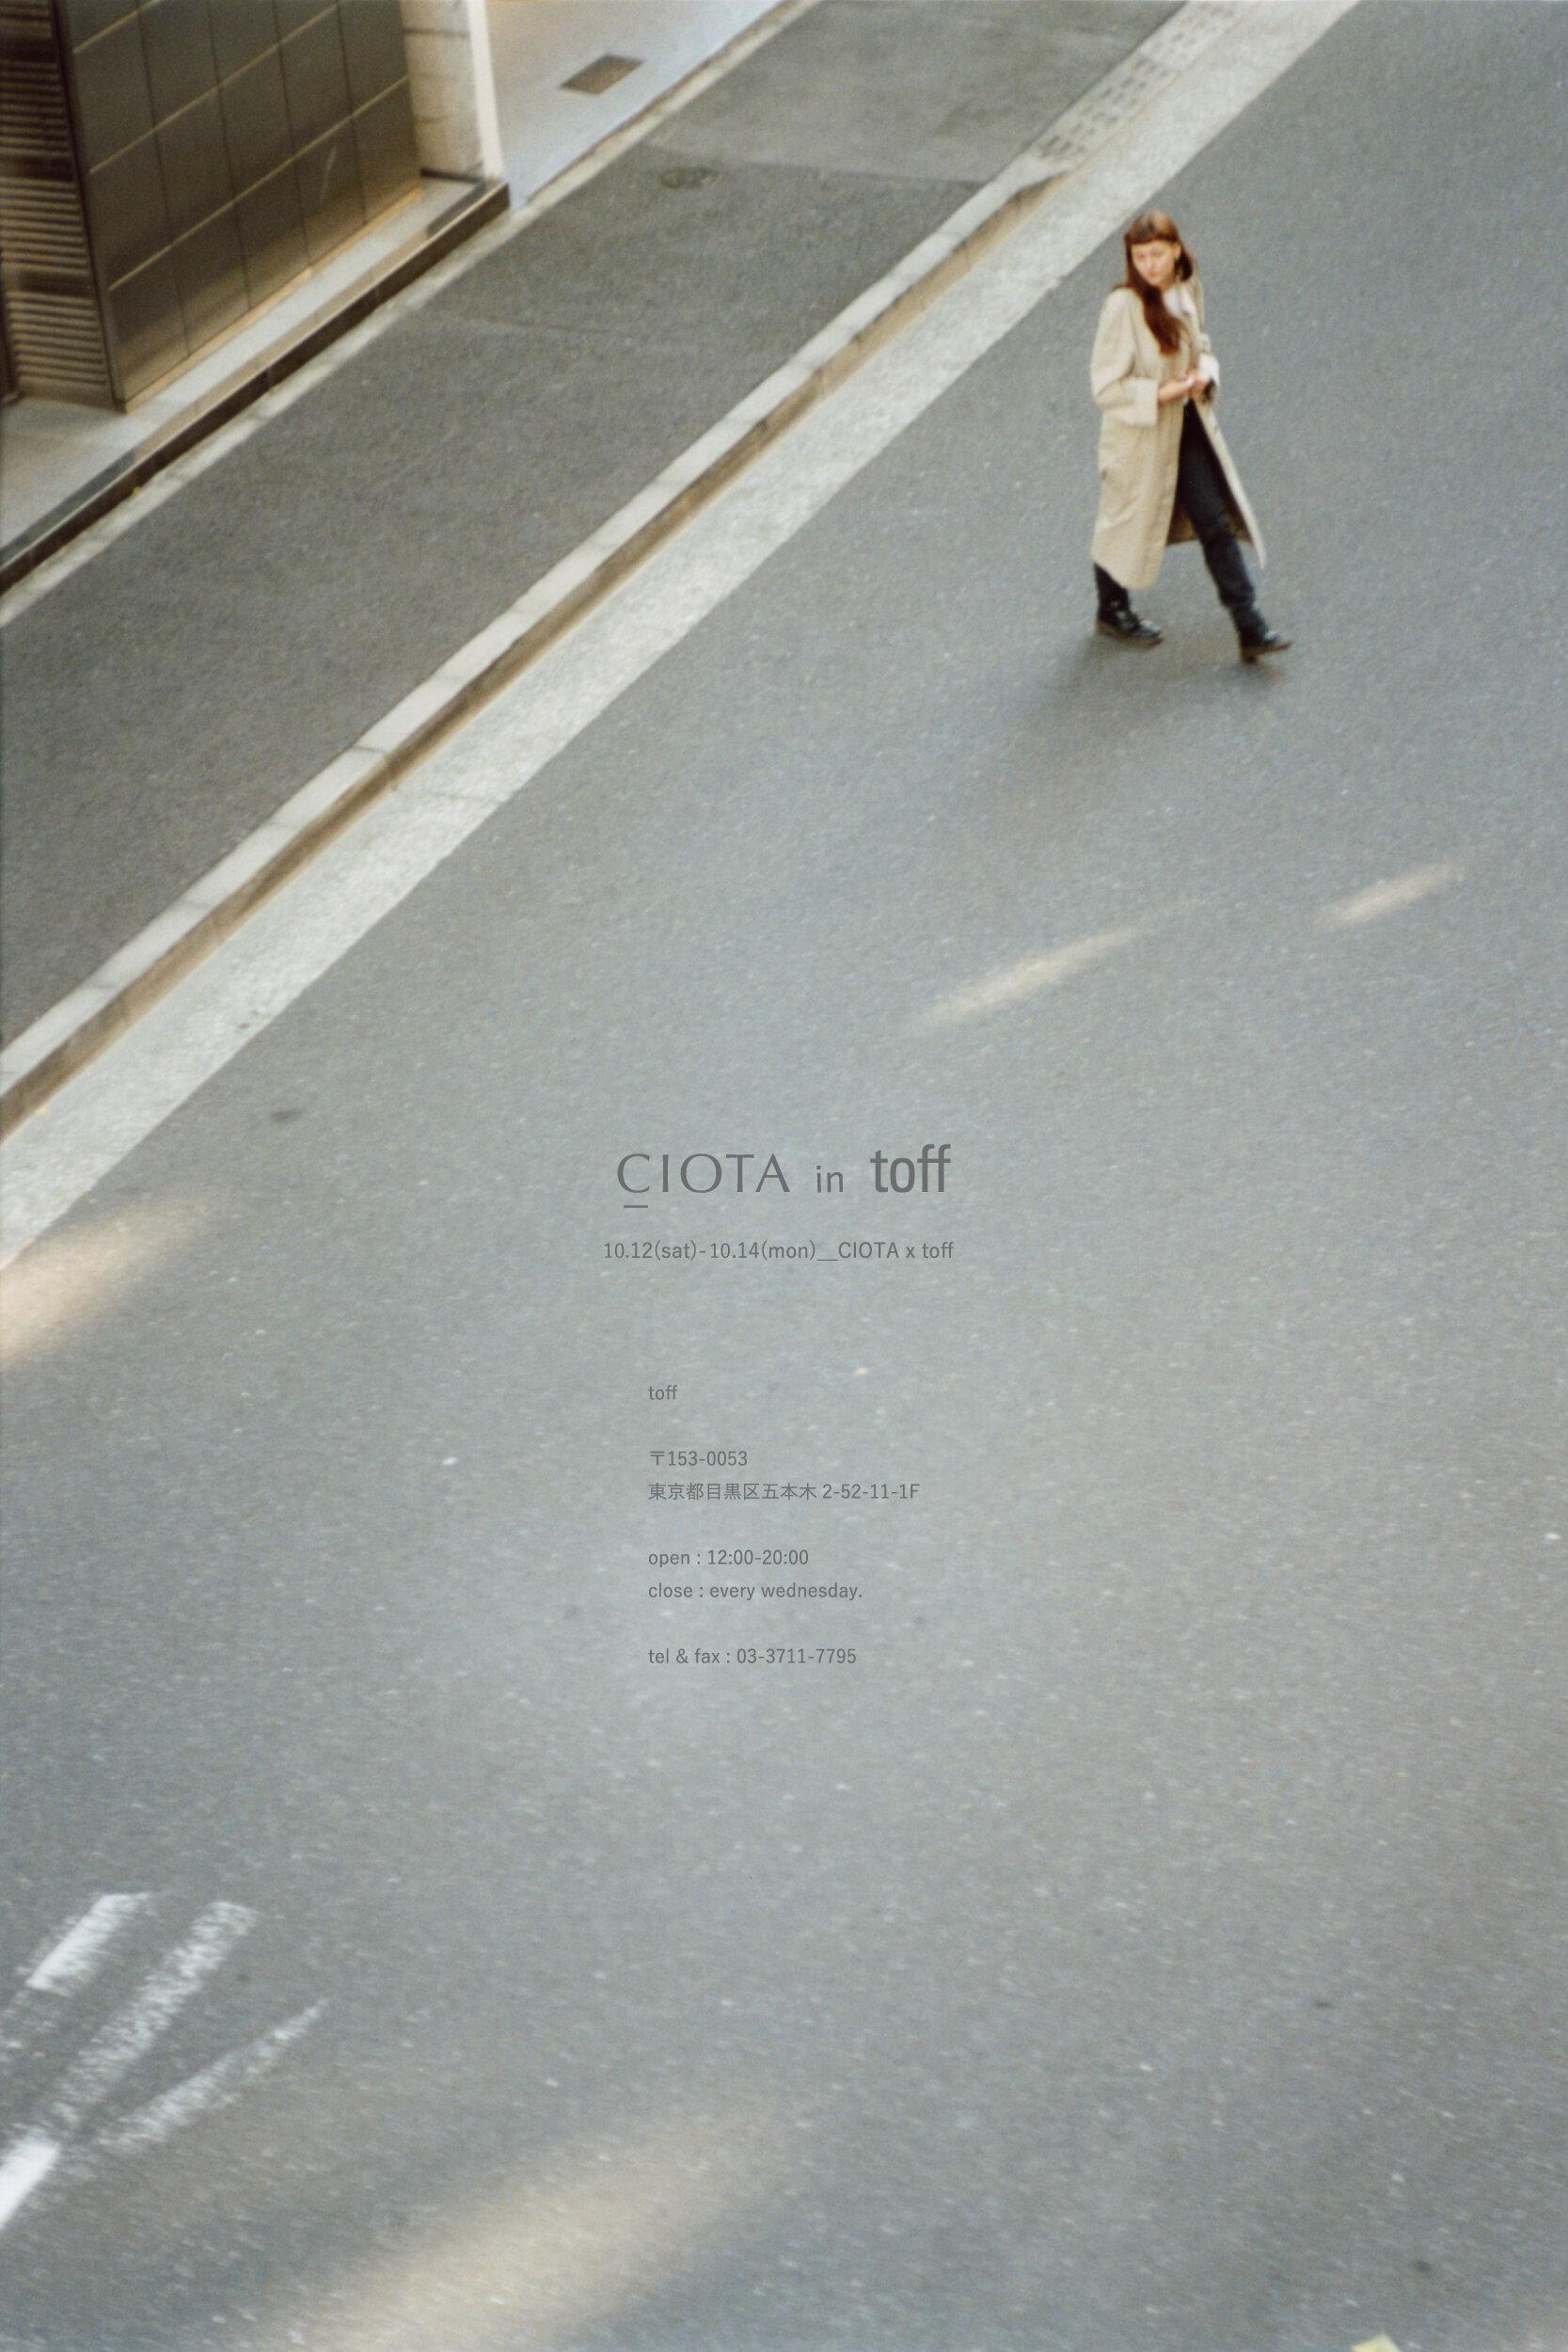 ciota-in-toff-1.jpg